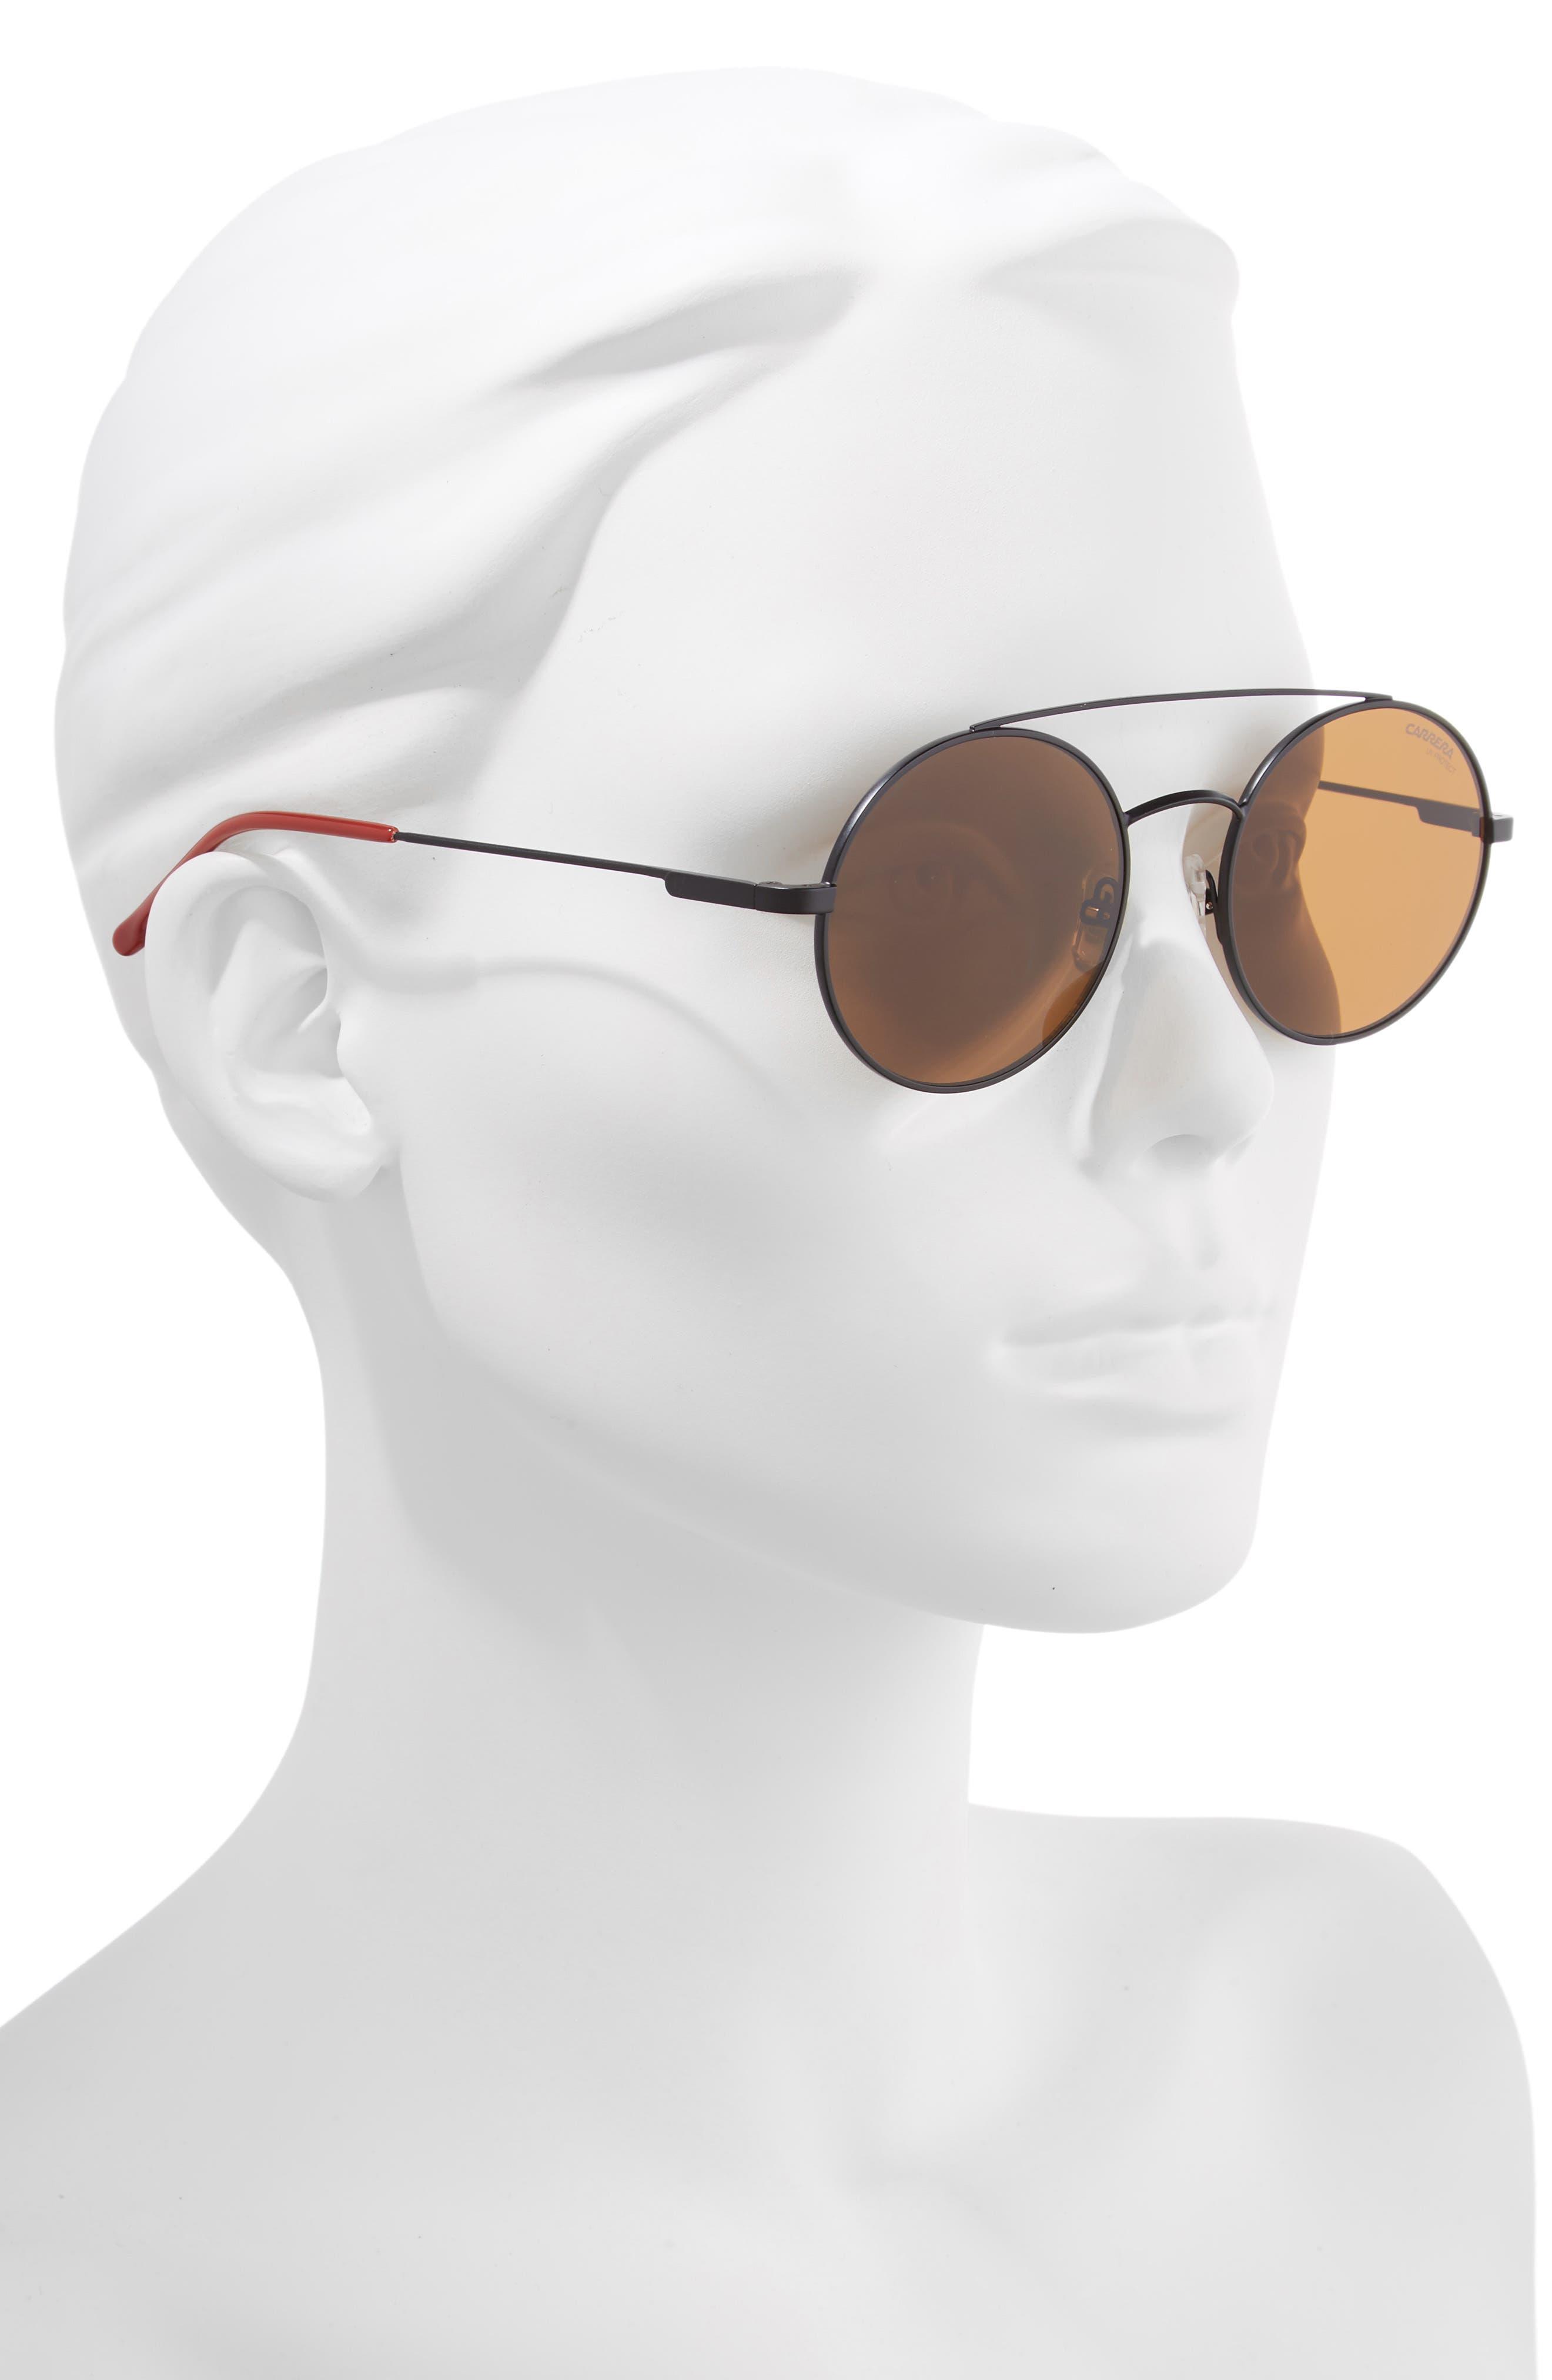 51mm Round Sunglasses,                             Alternate thumbnail 2, color,                             MATTE BLACK